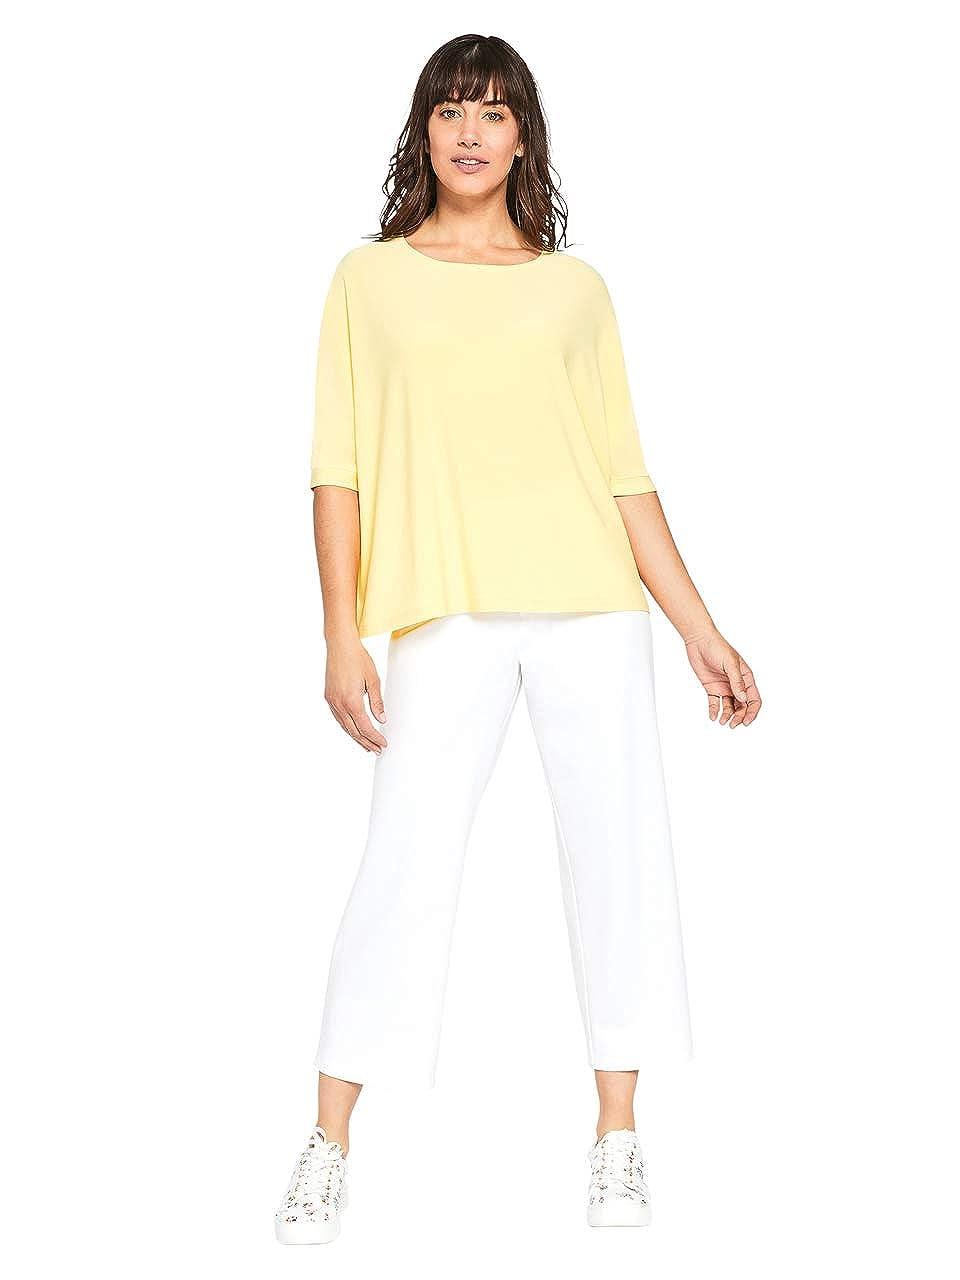 Sympli Womens Clip Top-Lemon